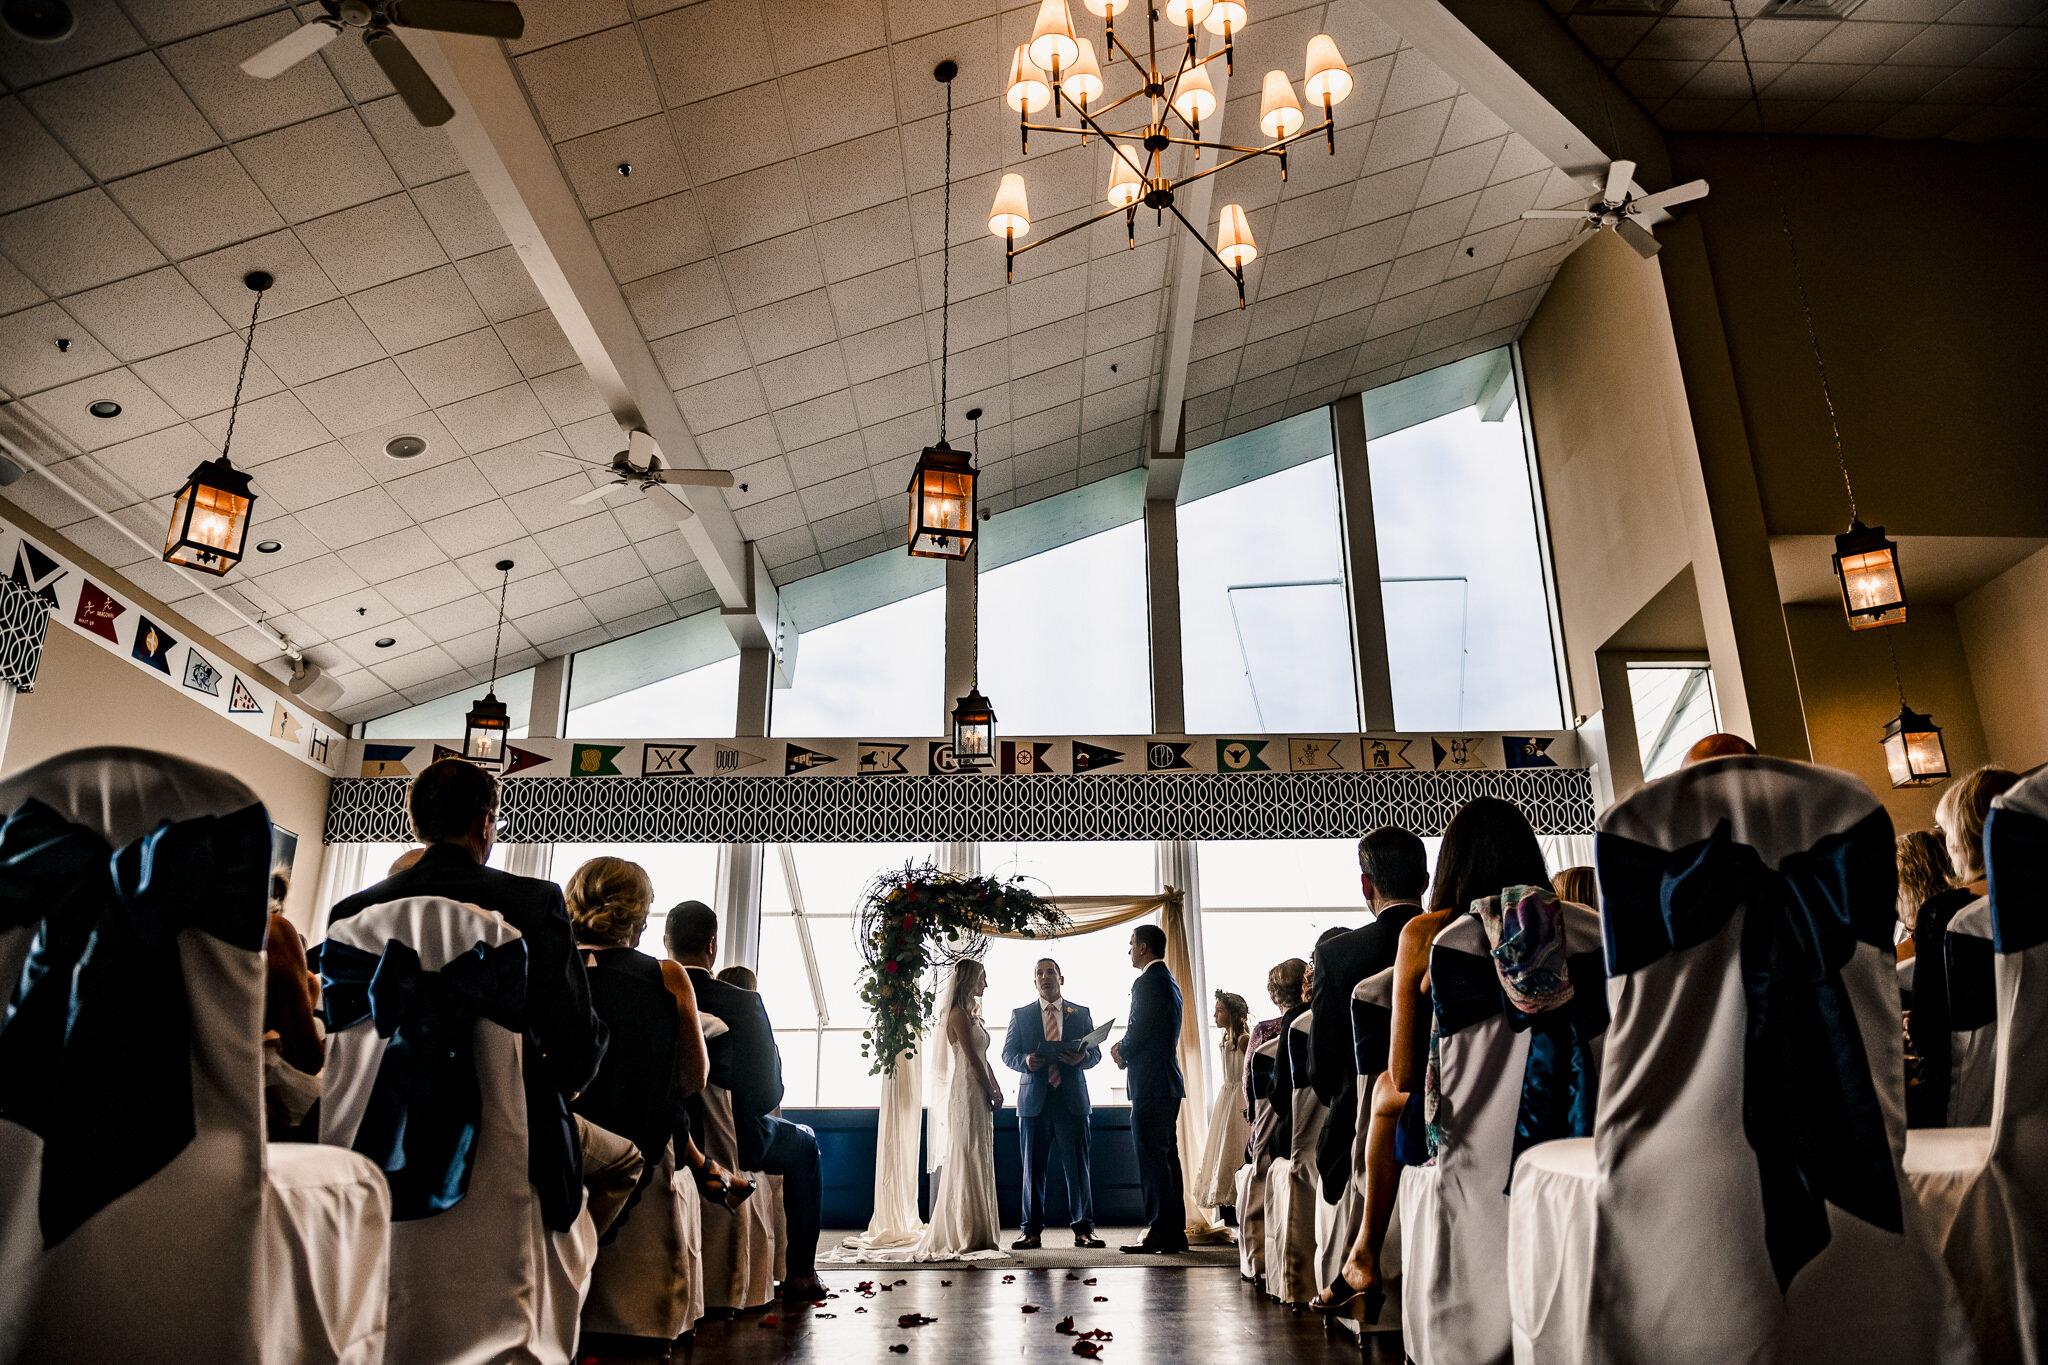 Snell-Ocean-City-Yacht-Club-New-Jersey-Wedding-Photographer-21.JPG